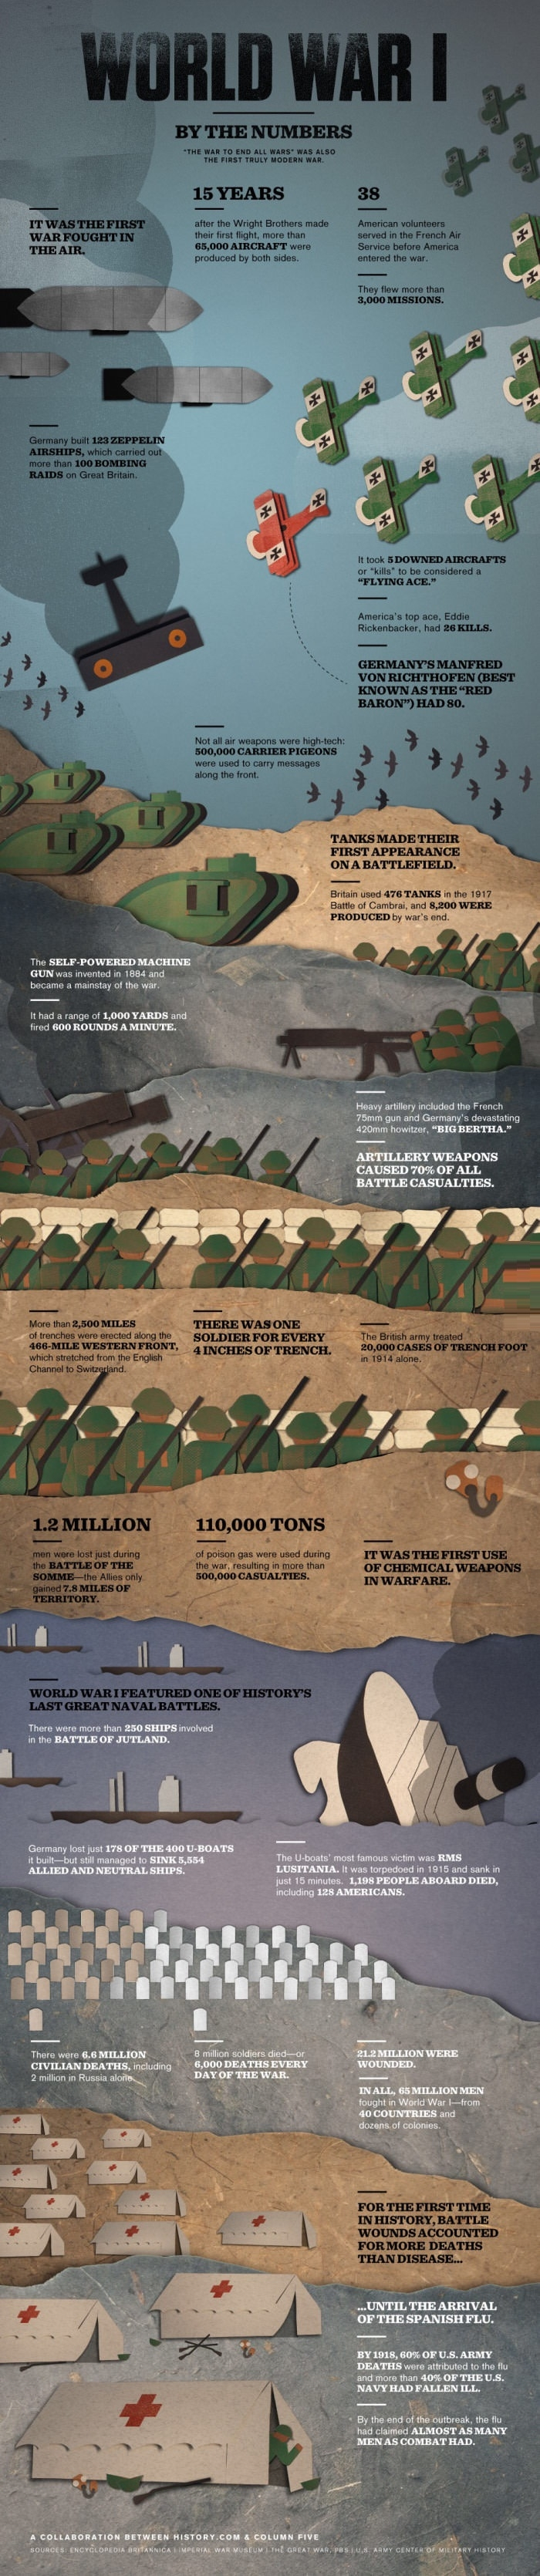 Statistics of WWI